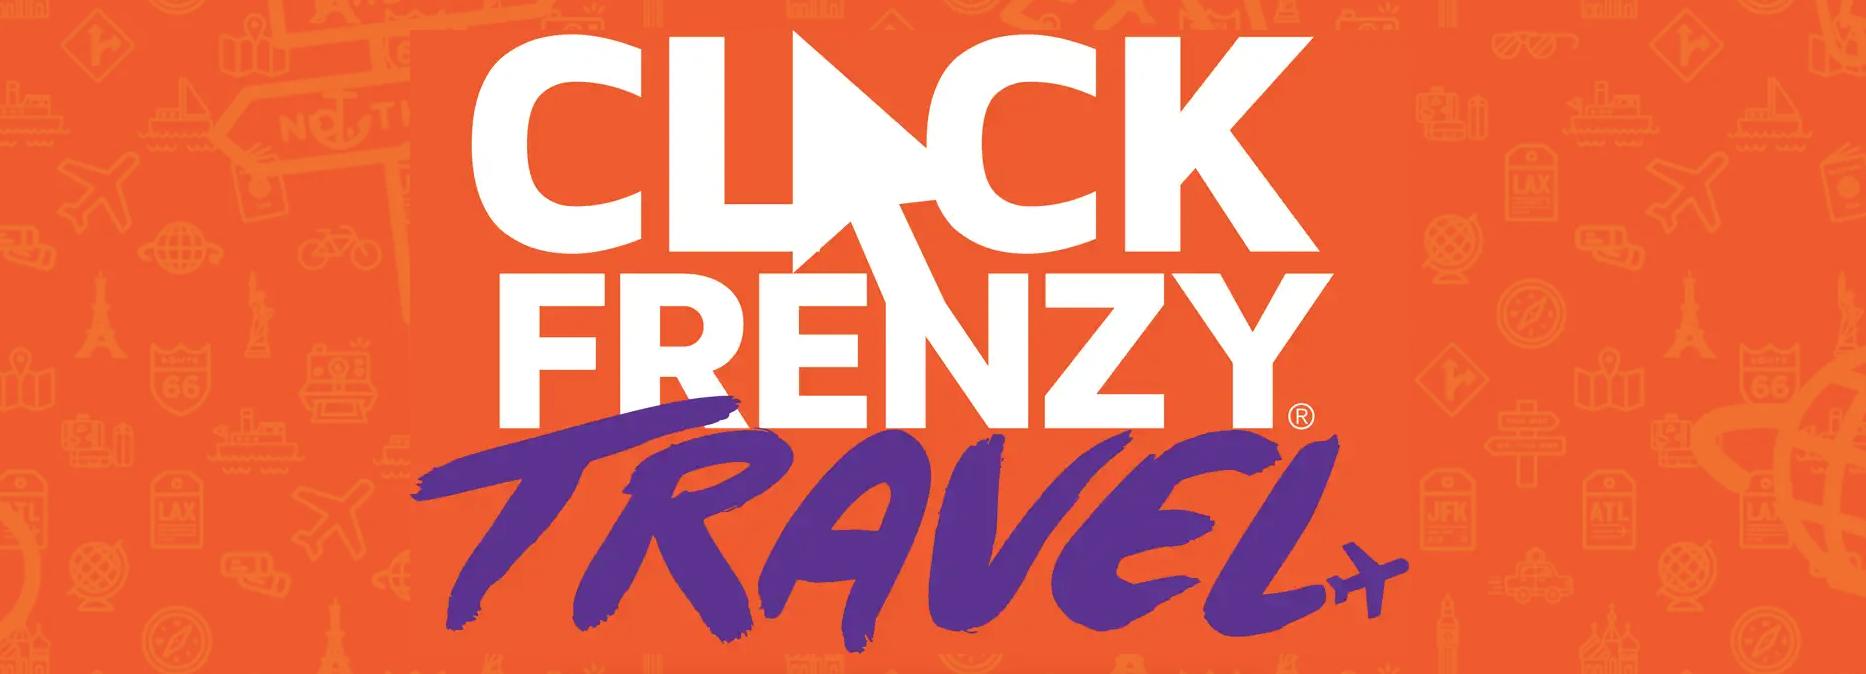 click frenzy travel